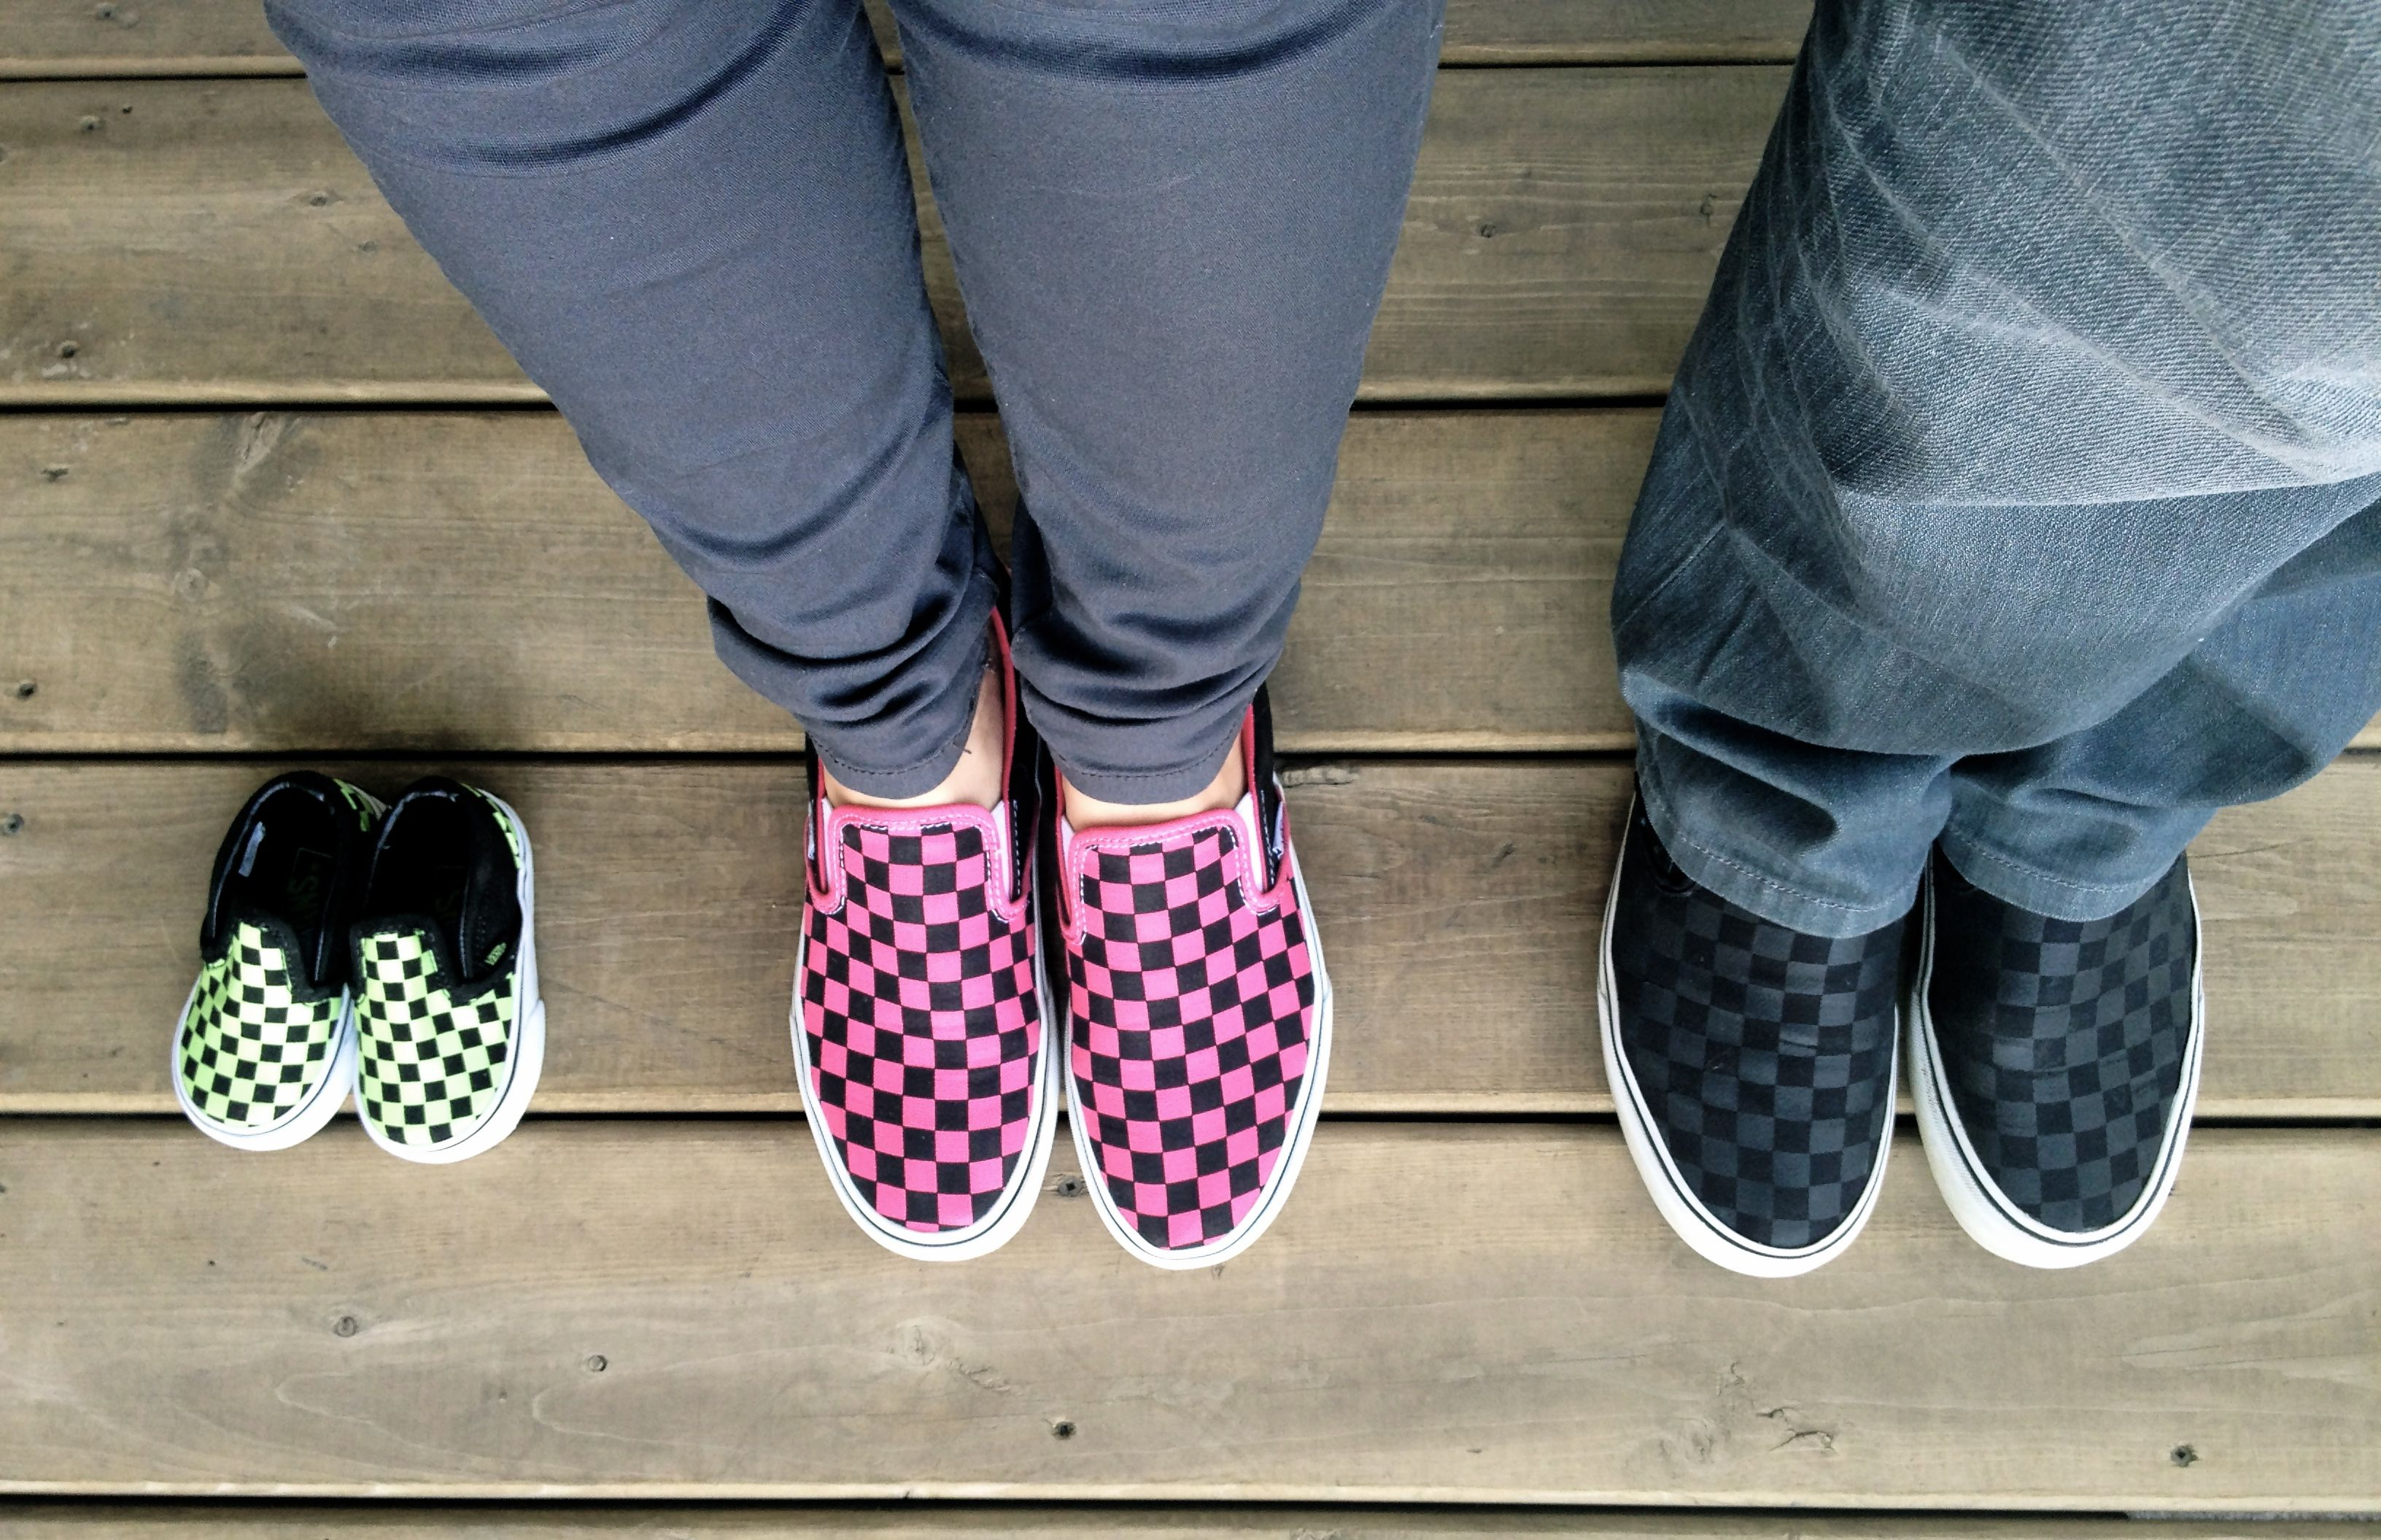 vans pram shoes